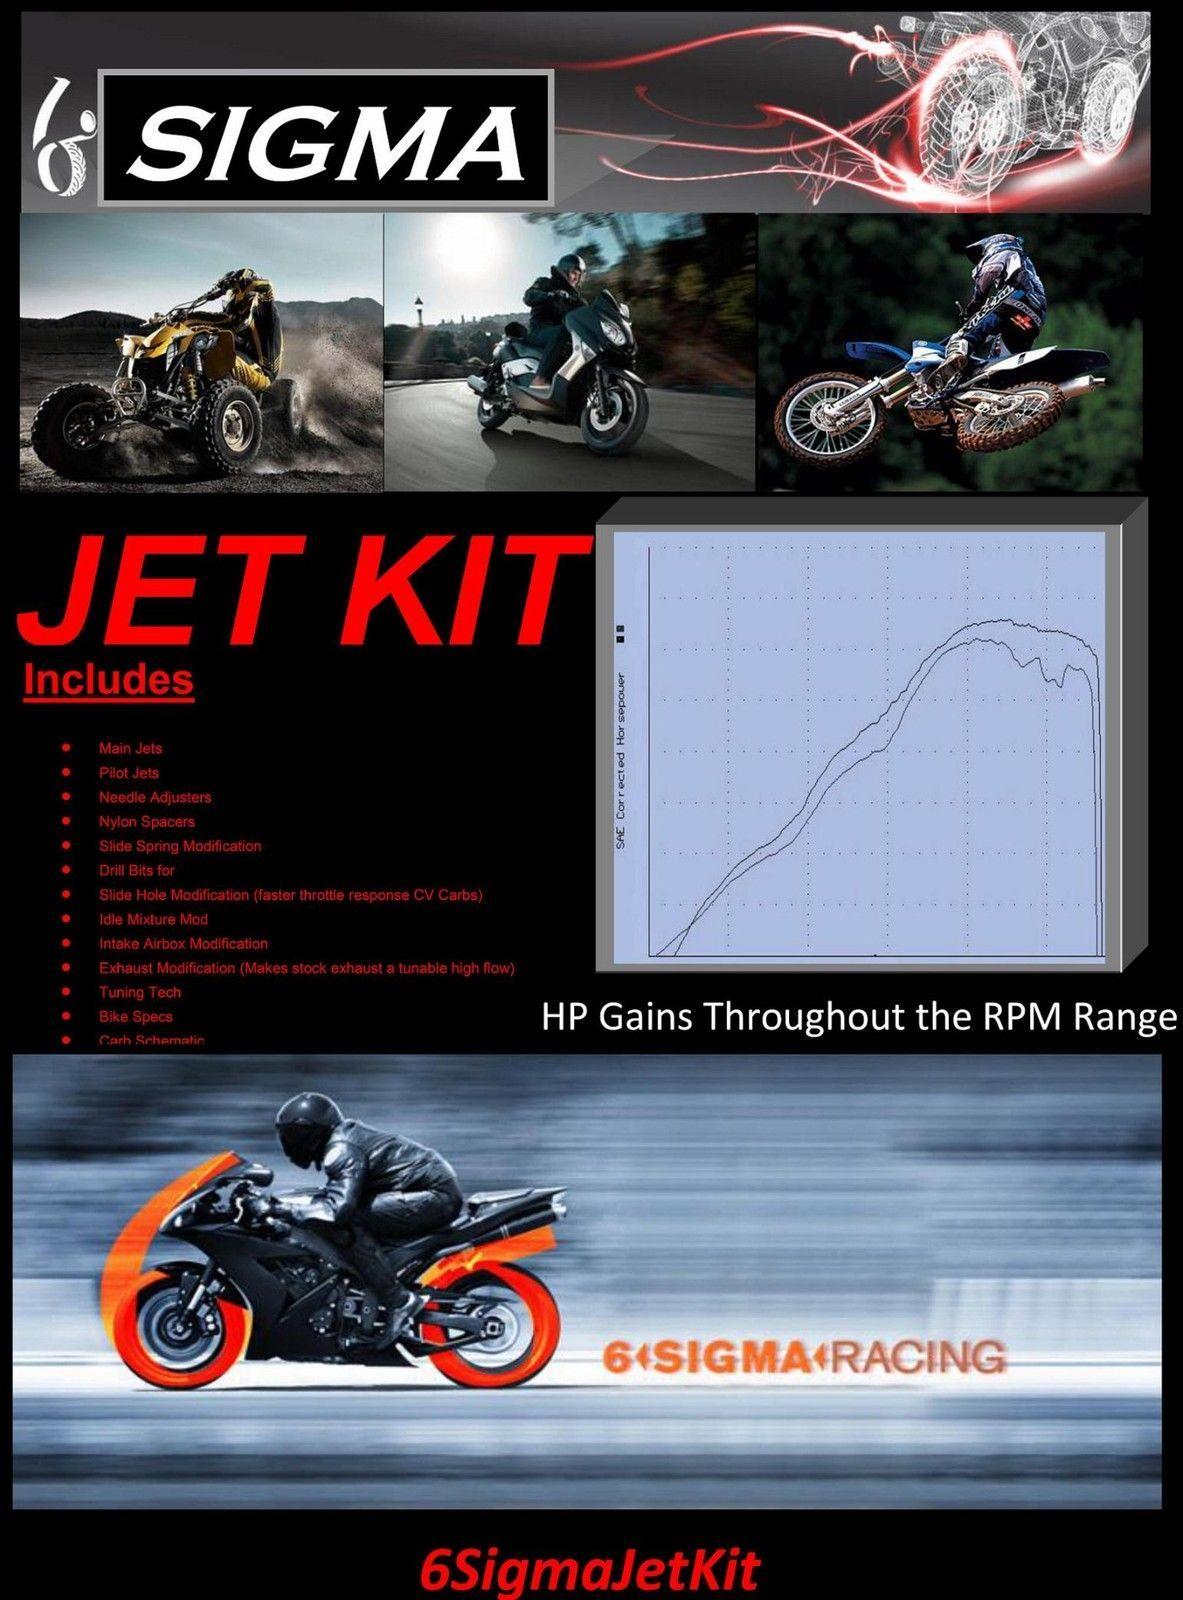 2009 Kawasaki Kfx 700 Wiring Diagram. Kawasaki Kfx 700 Tires ... on